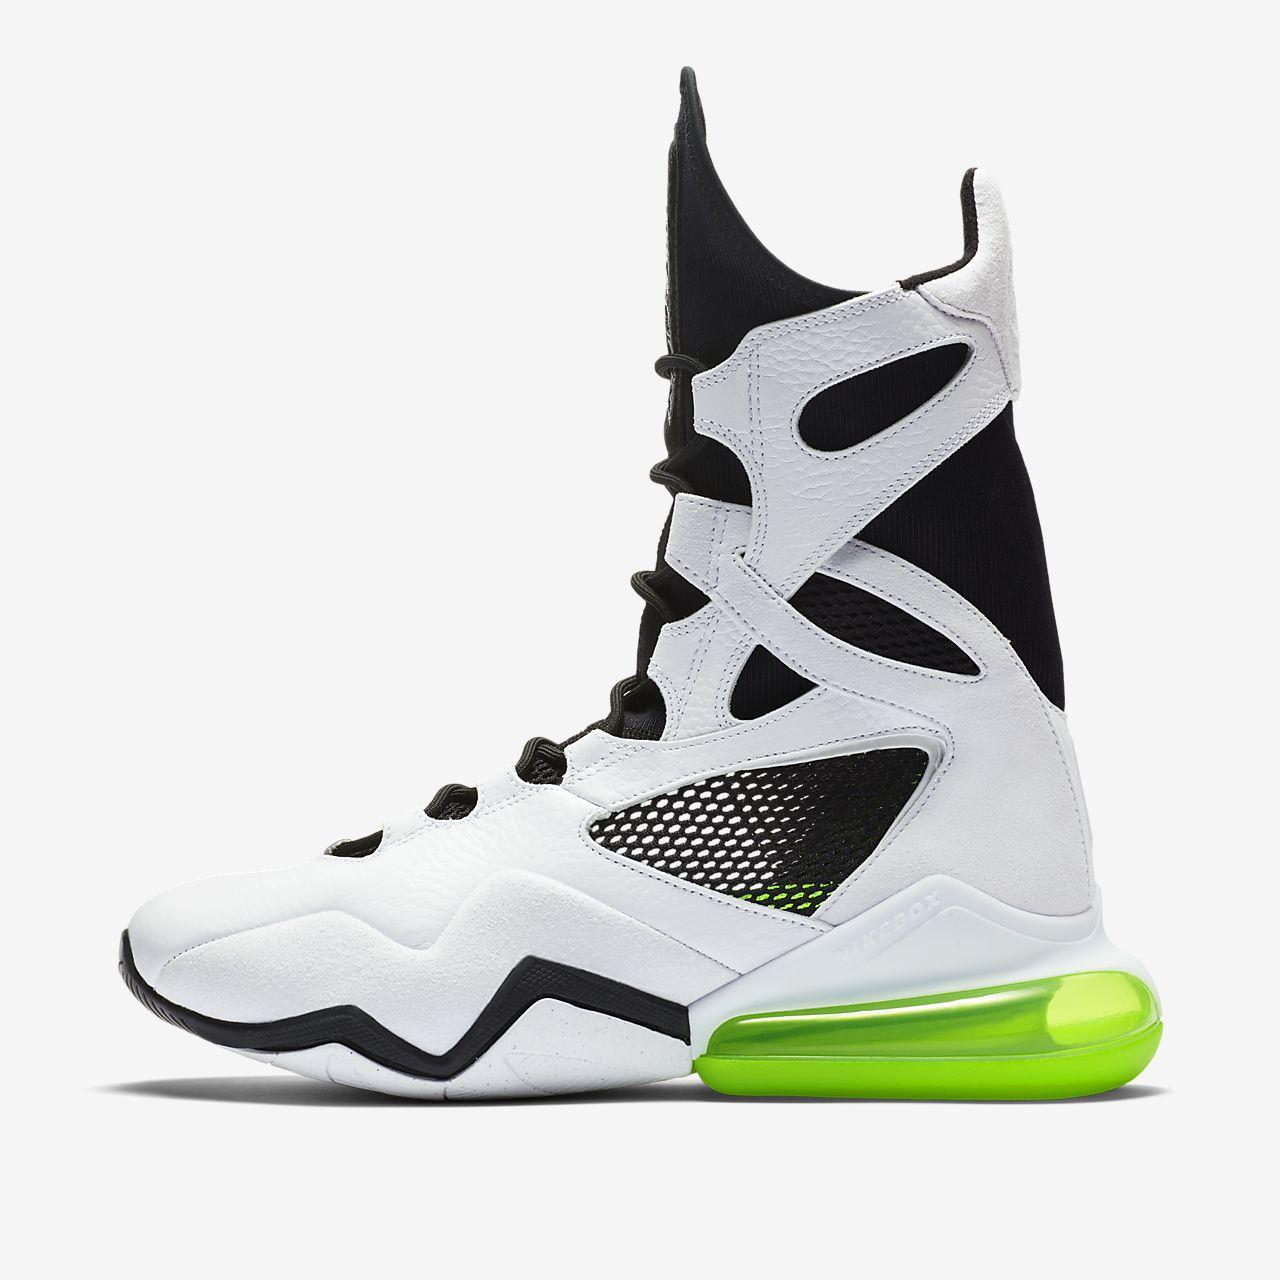 Nike Air Max Box Trainingsschoen voor dames